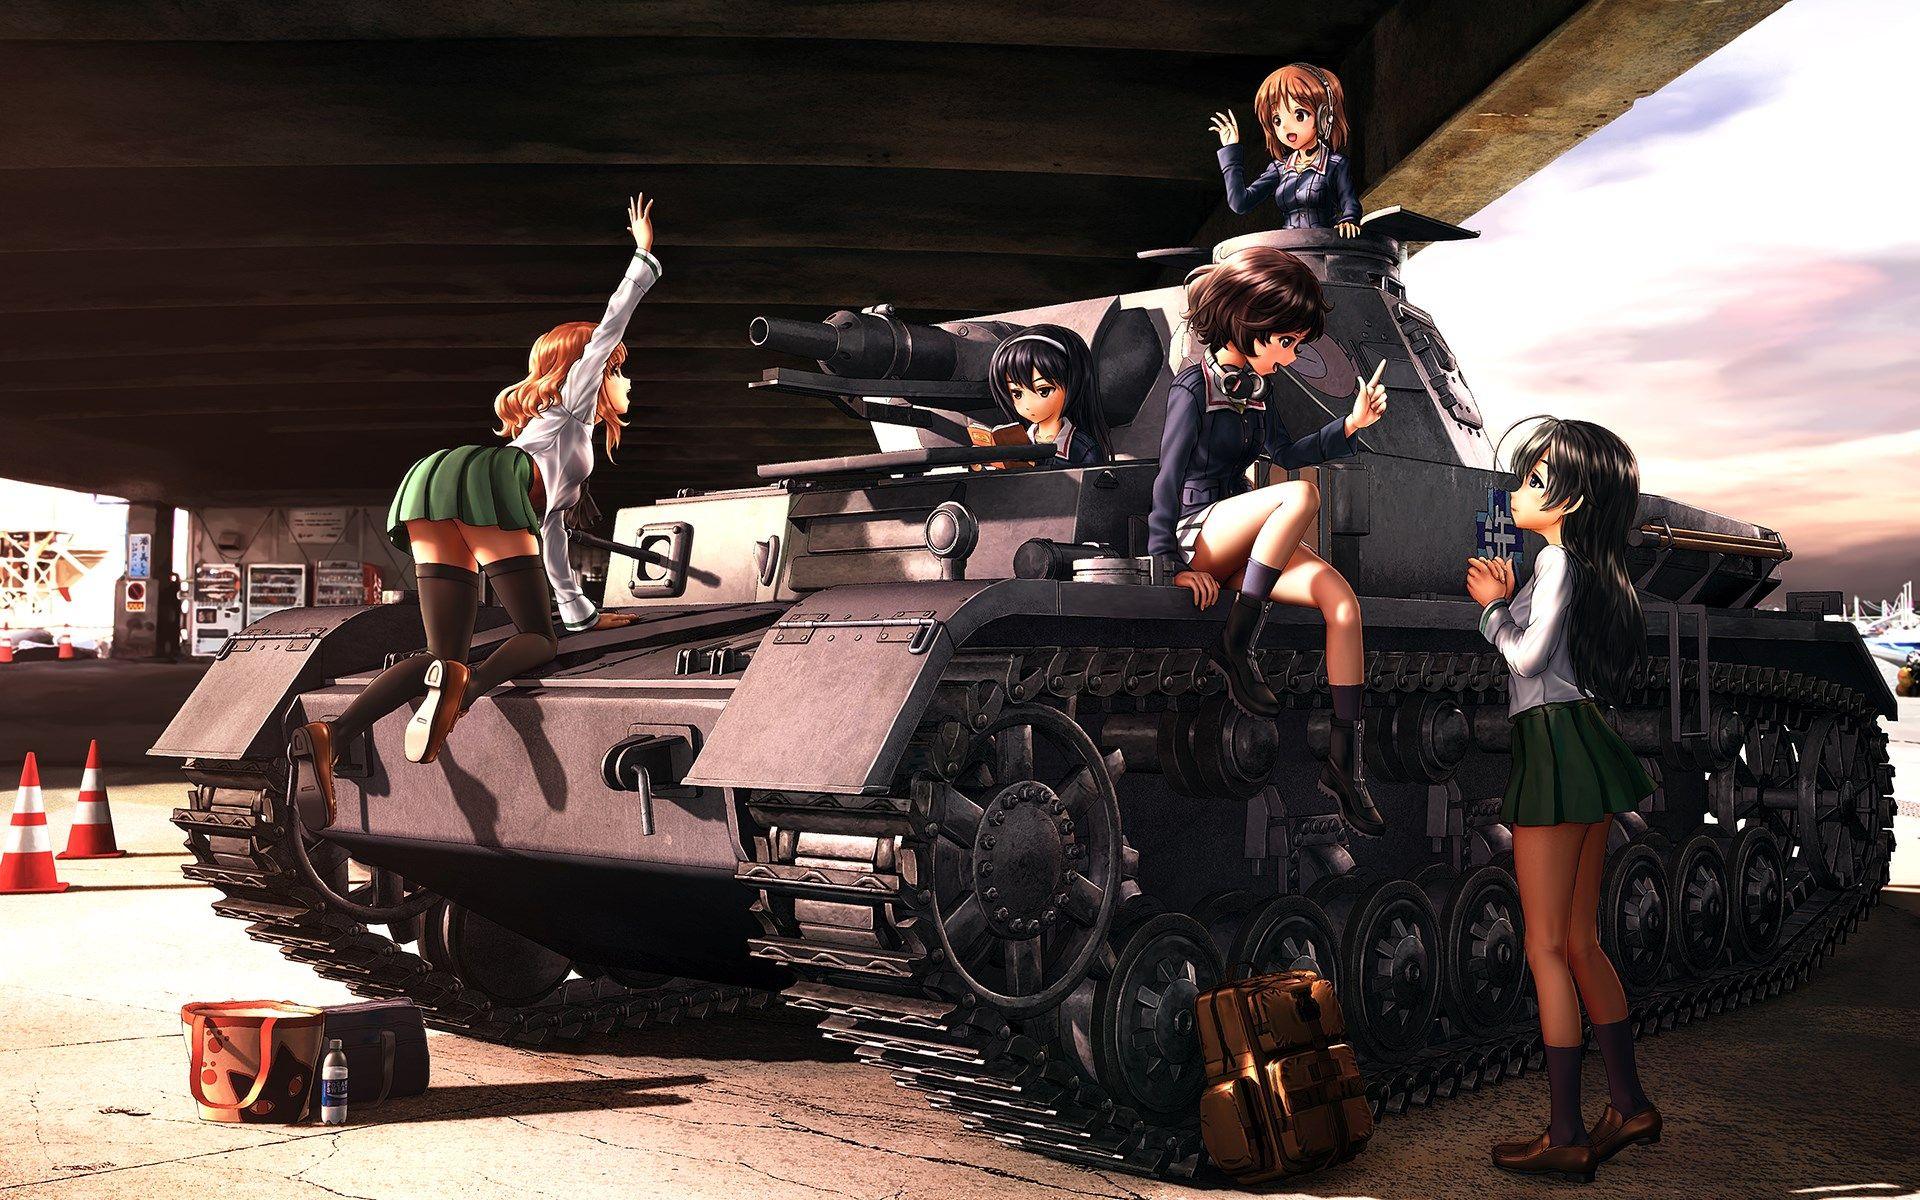 1920x1200 px Quality Cool girls und panzer wallpaper by